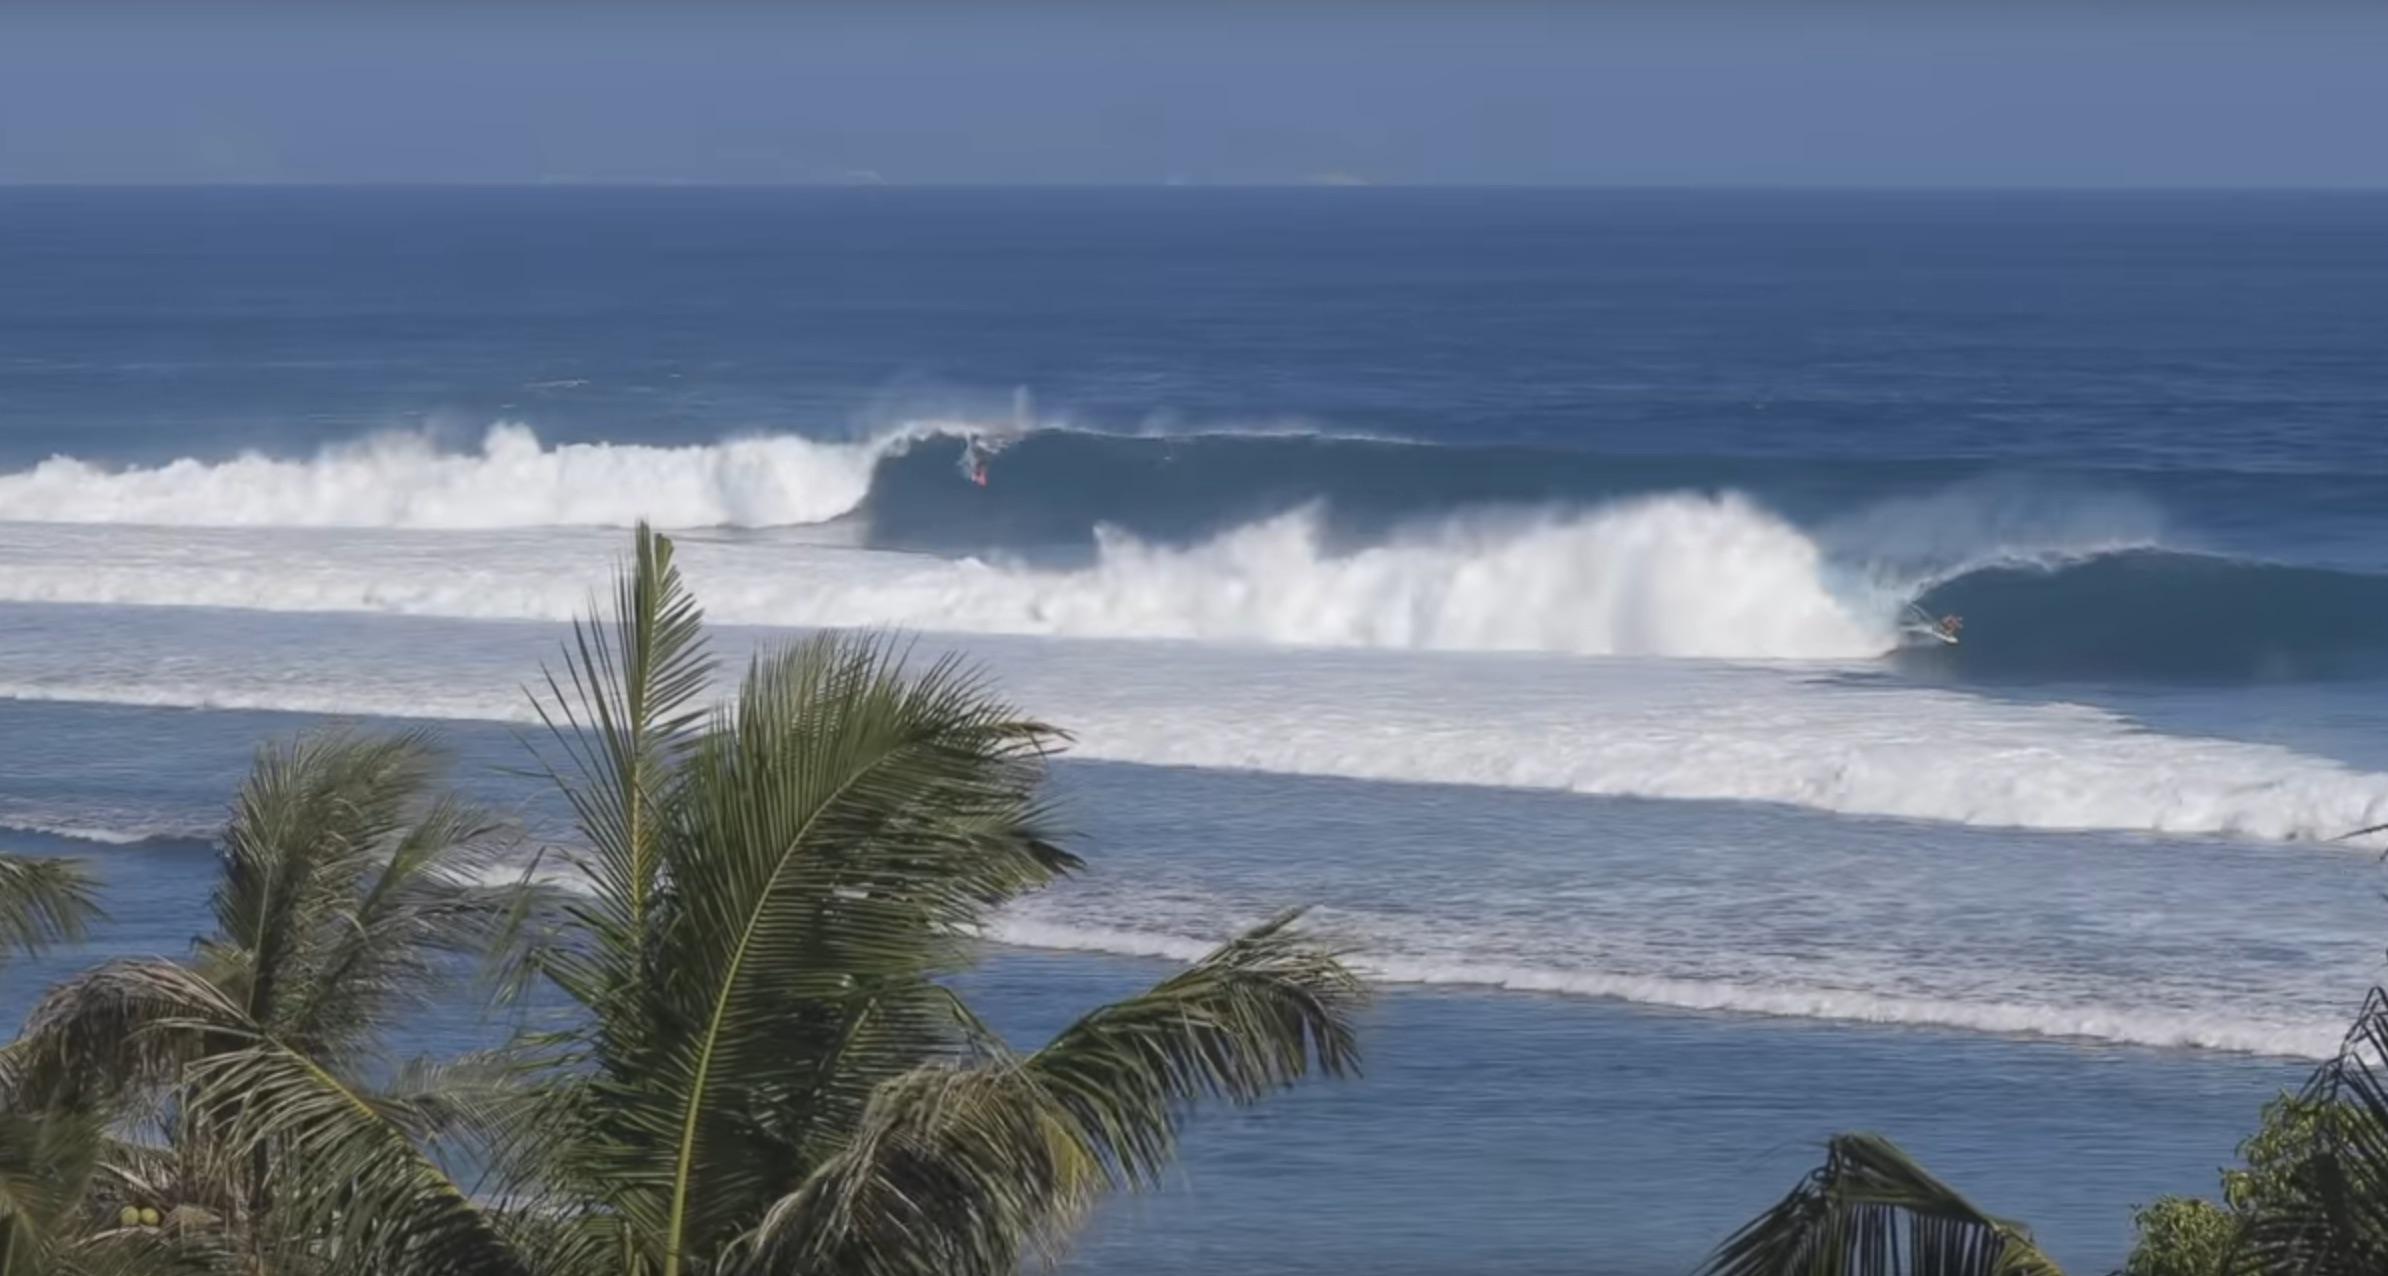 Rizal Tanjung & Bronson Meydi scoren perfekte Barrels in Desert Point